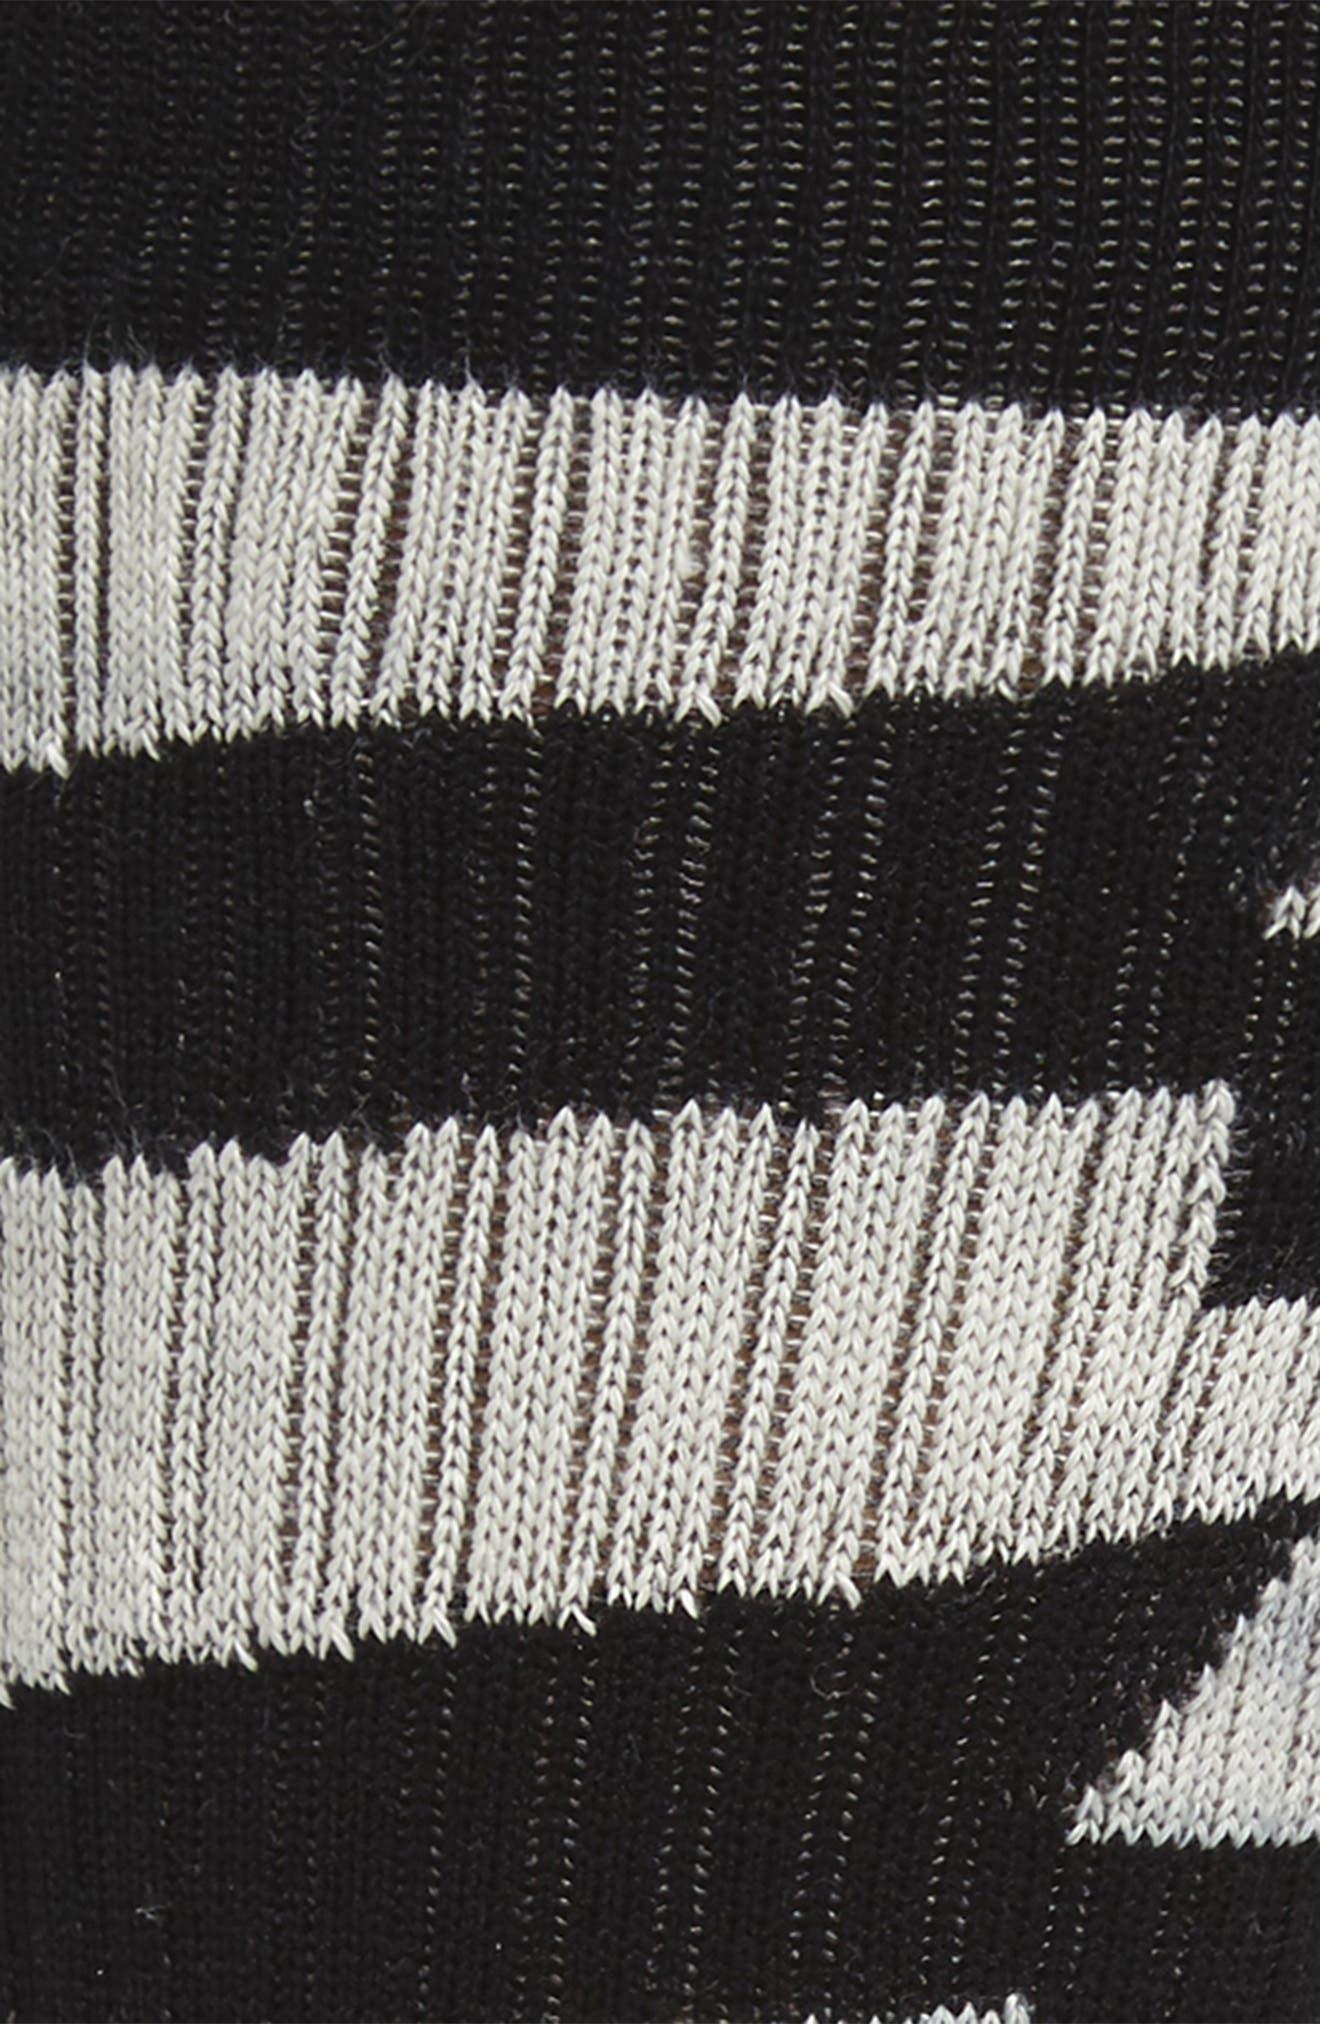 Sidereal Crew Socks,                             Alternate thumbnail 2, color,                             030